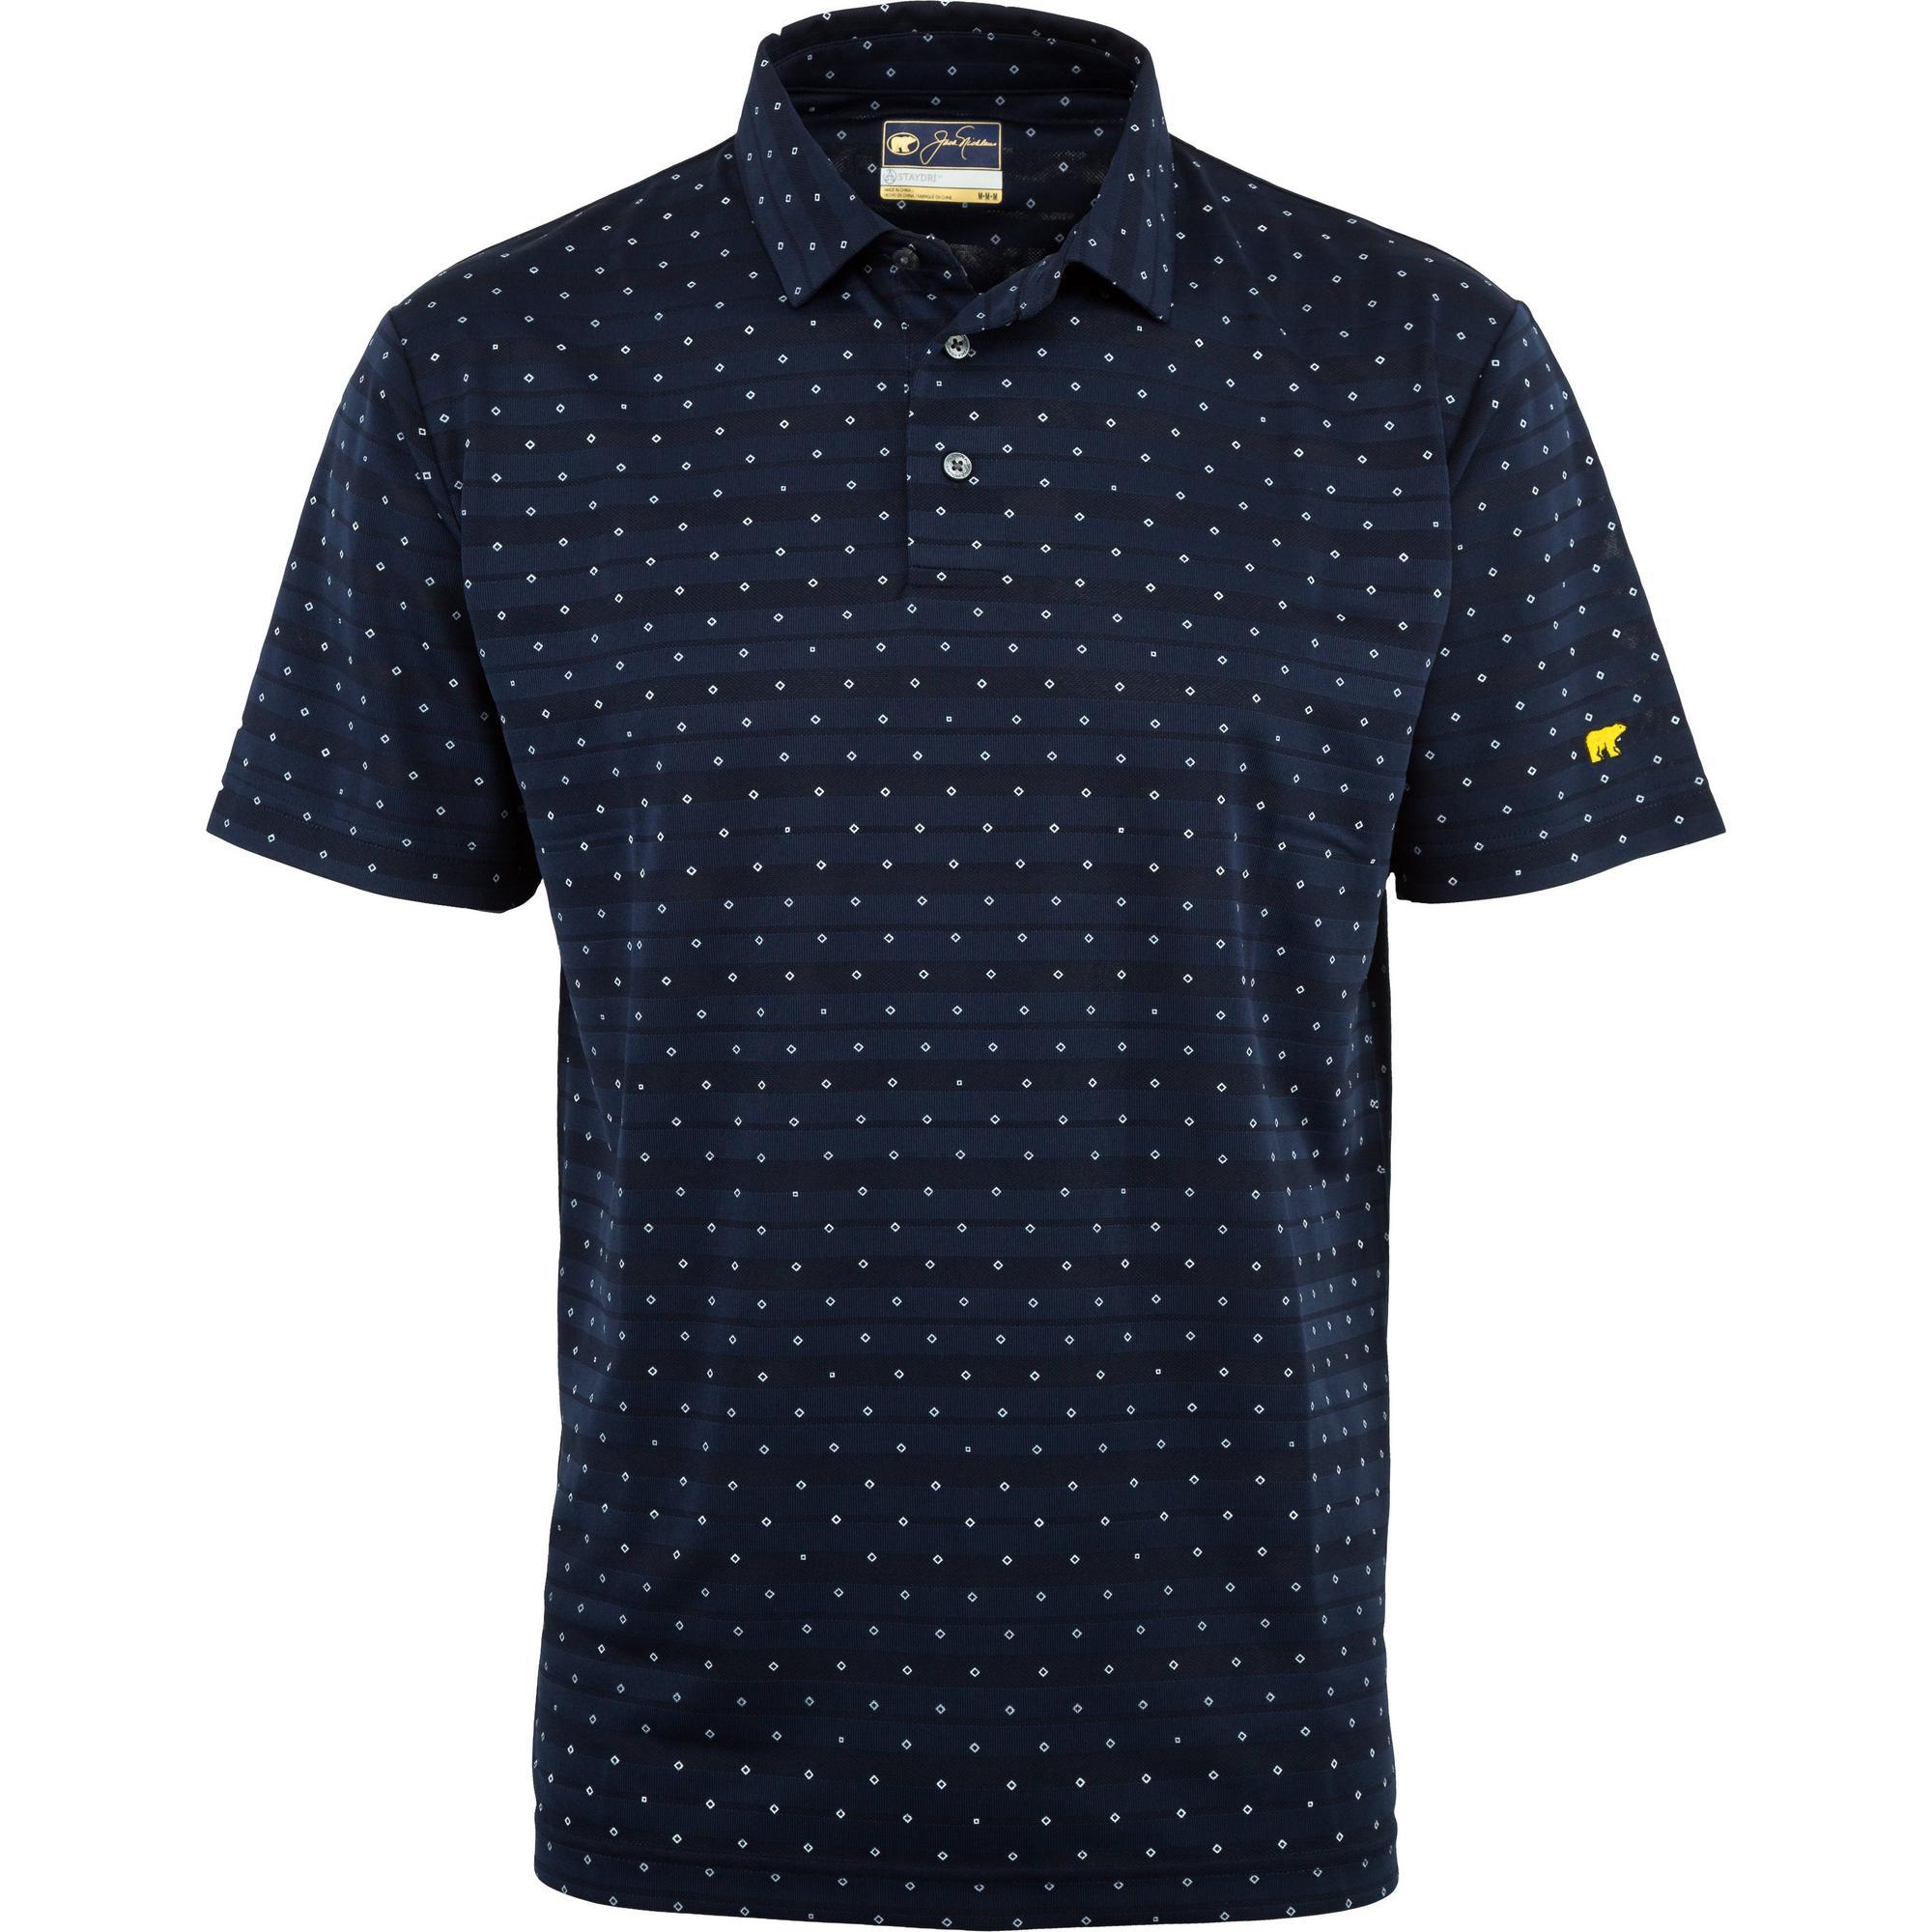 Men's Mini Diamond All Over Print Short Sleeve Shirt